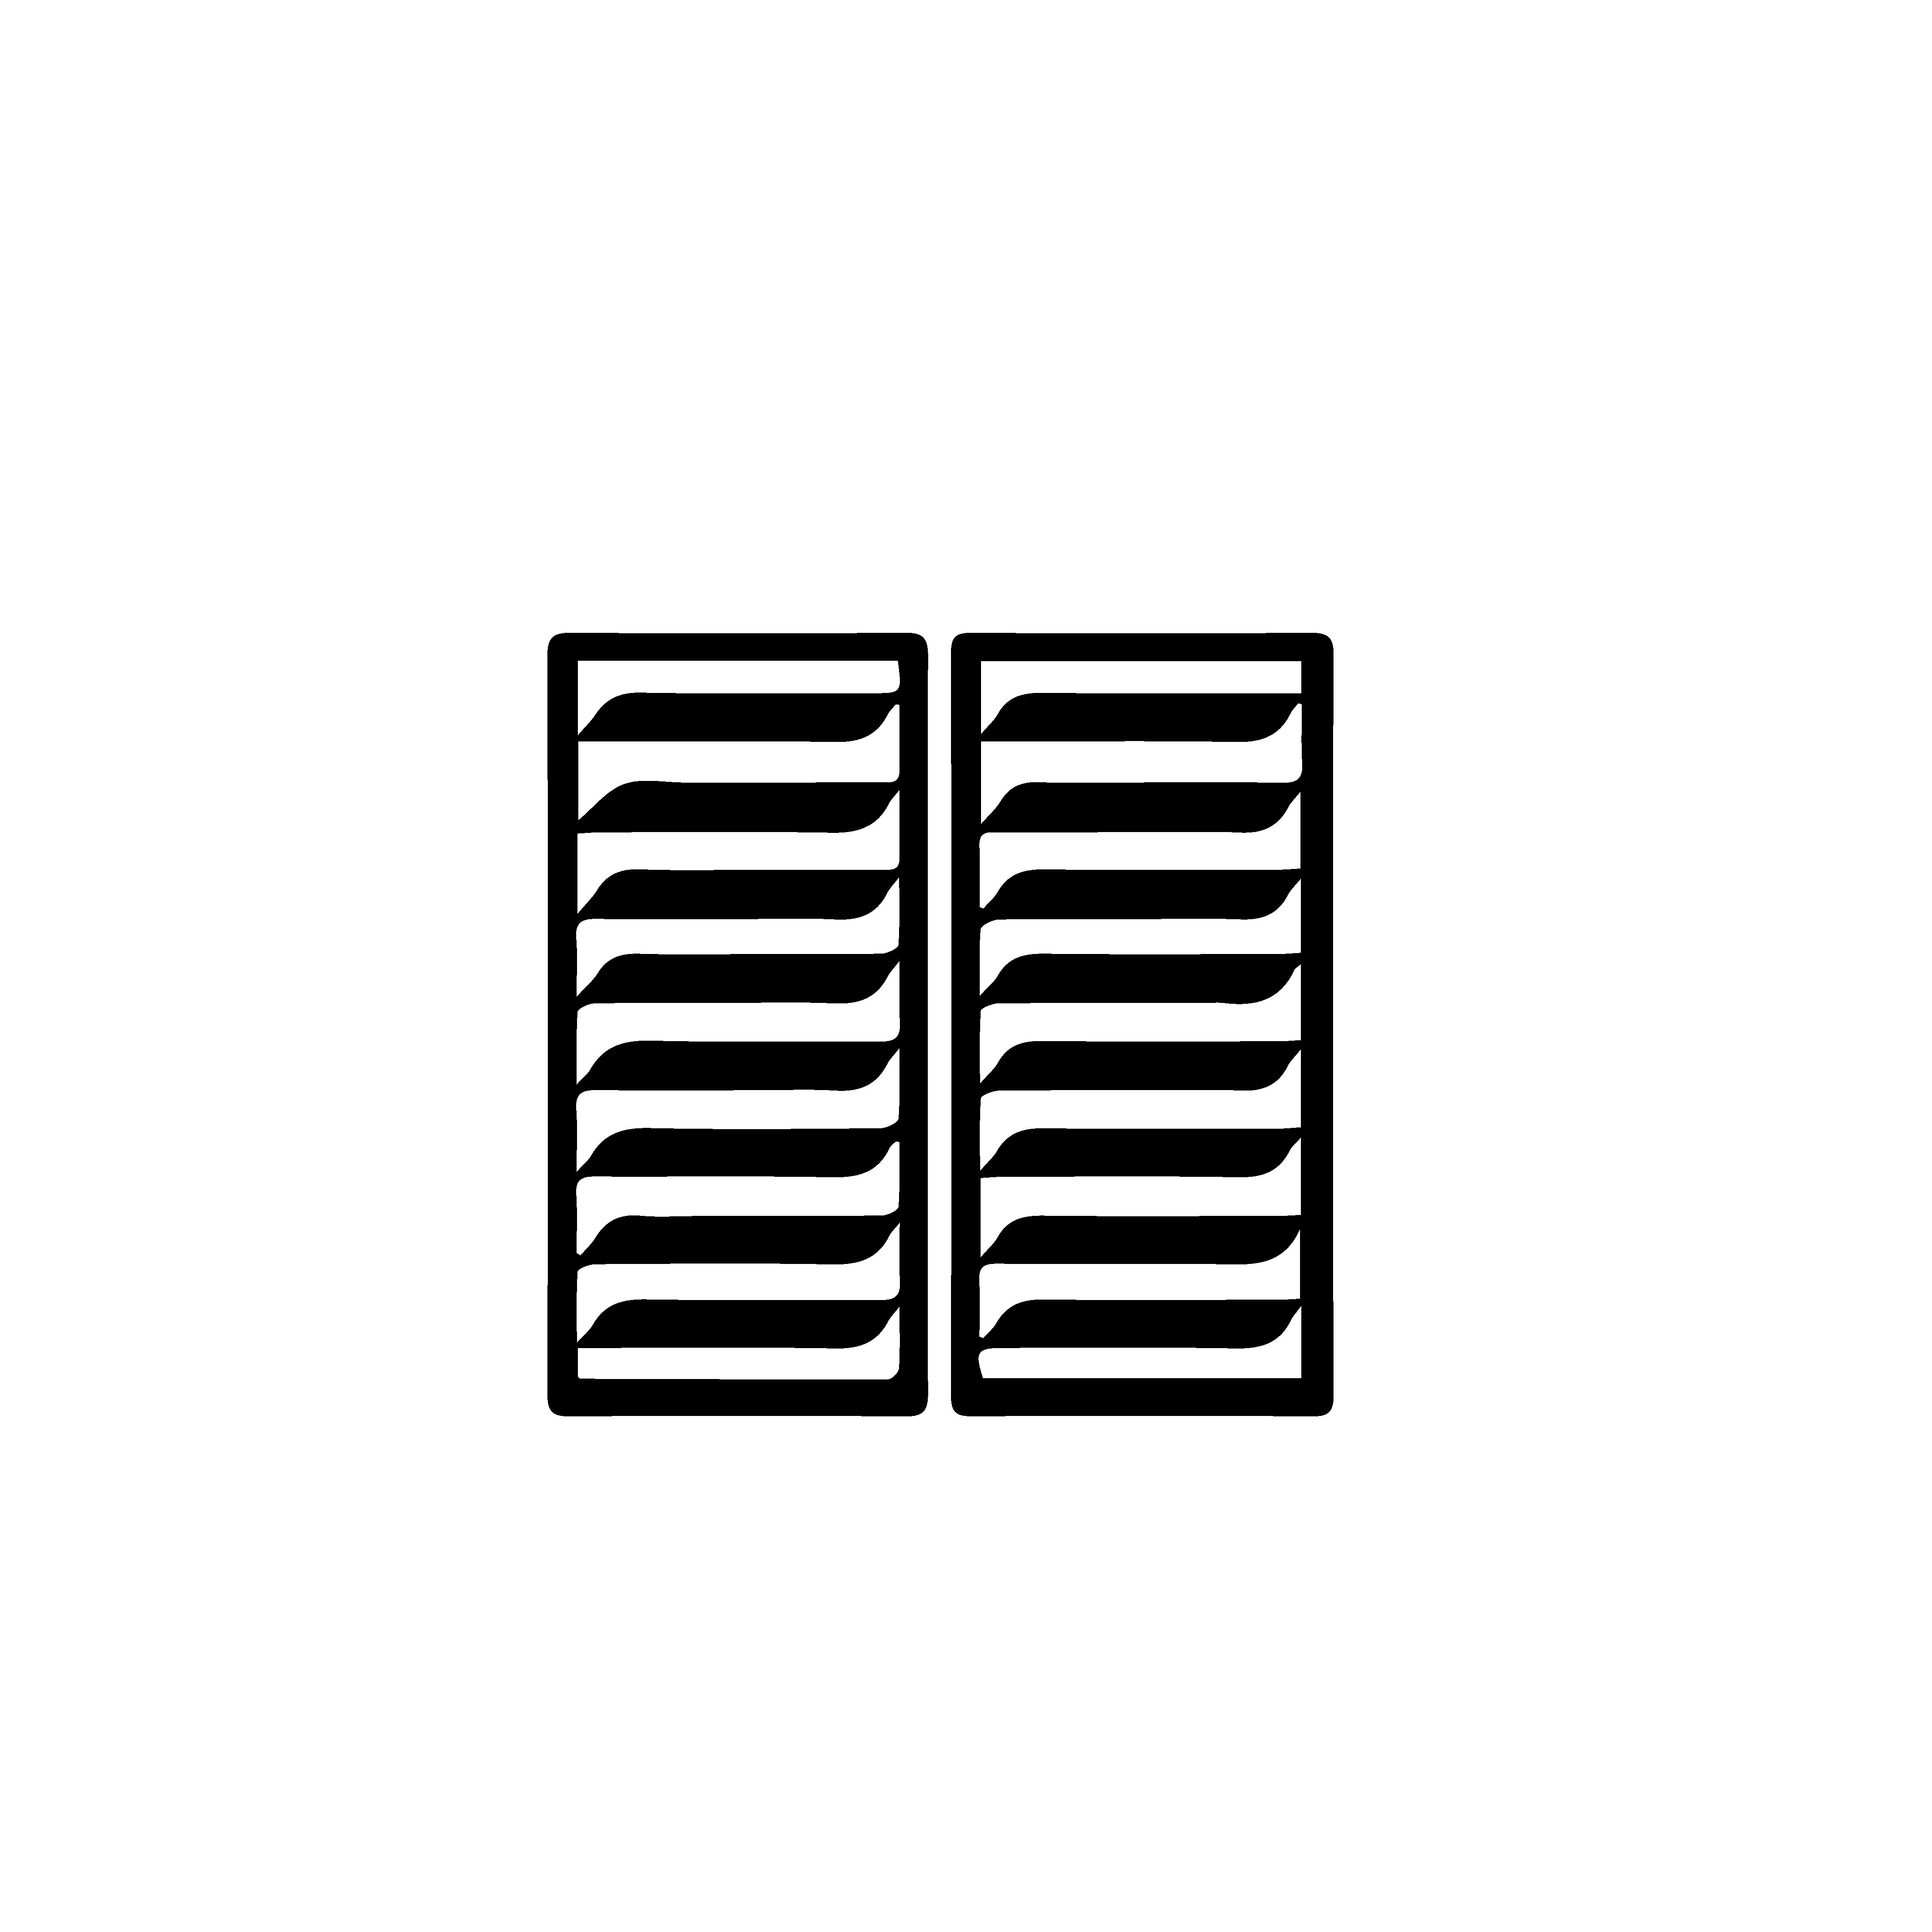 Persiane